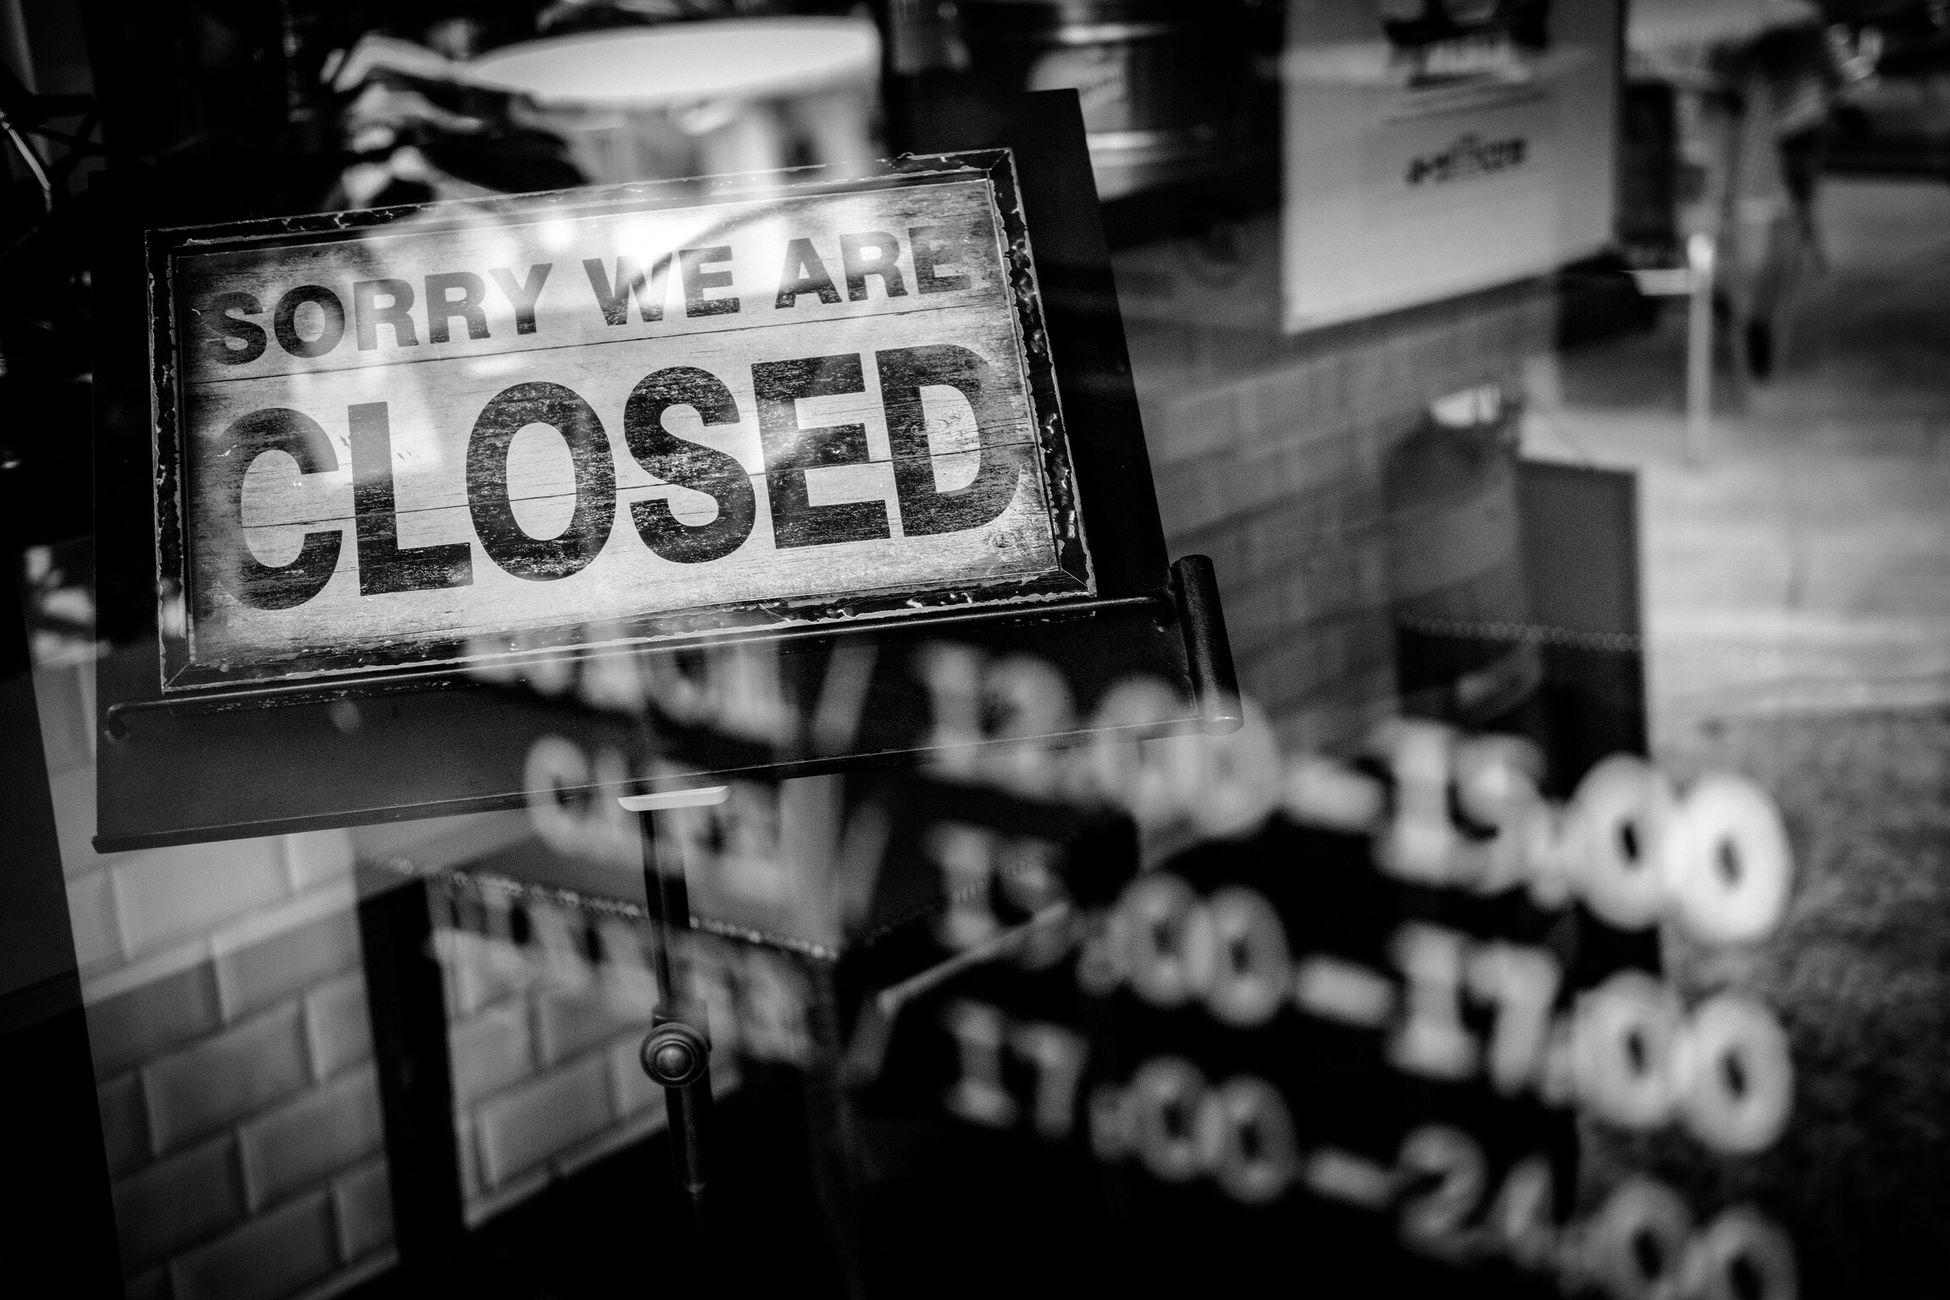 仙台 仙台雑景 Closed